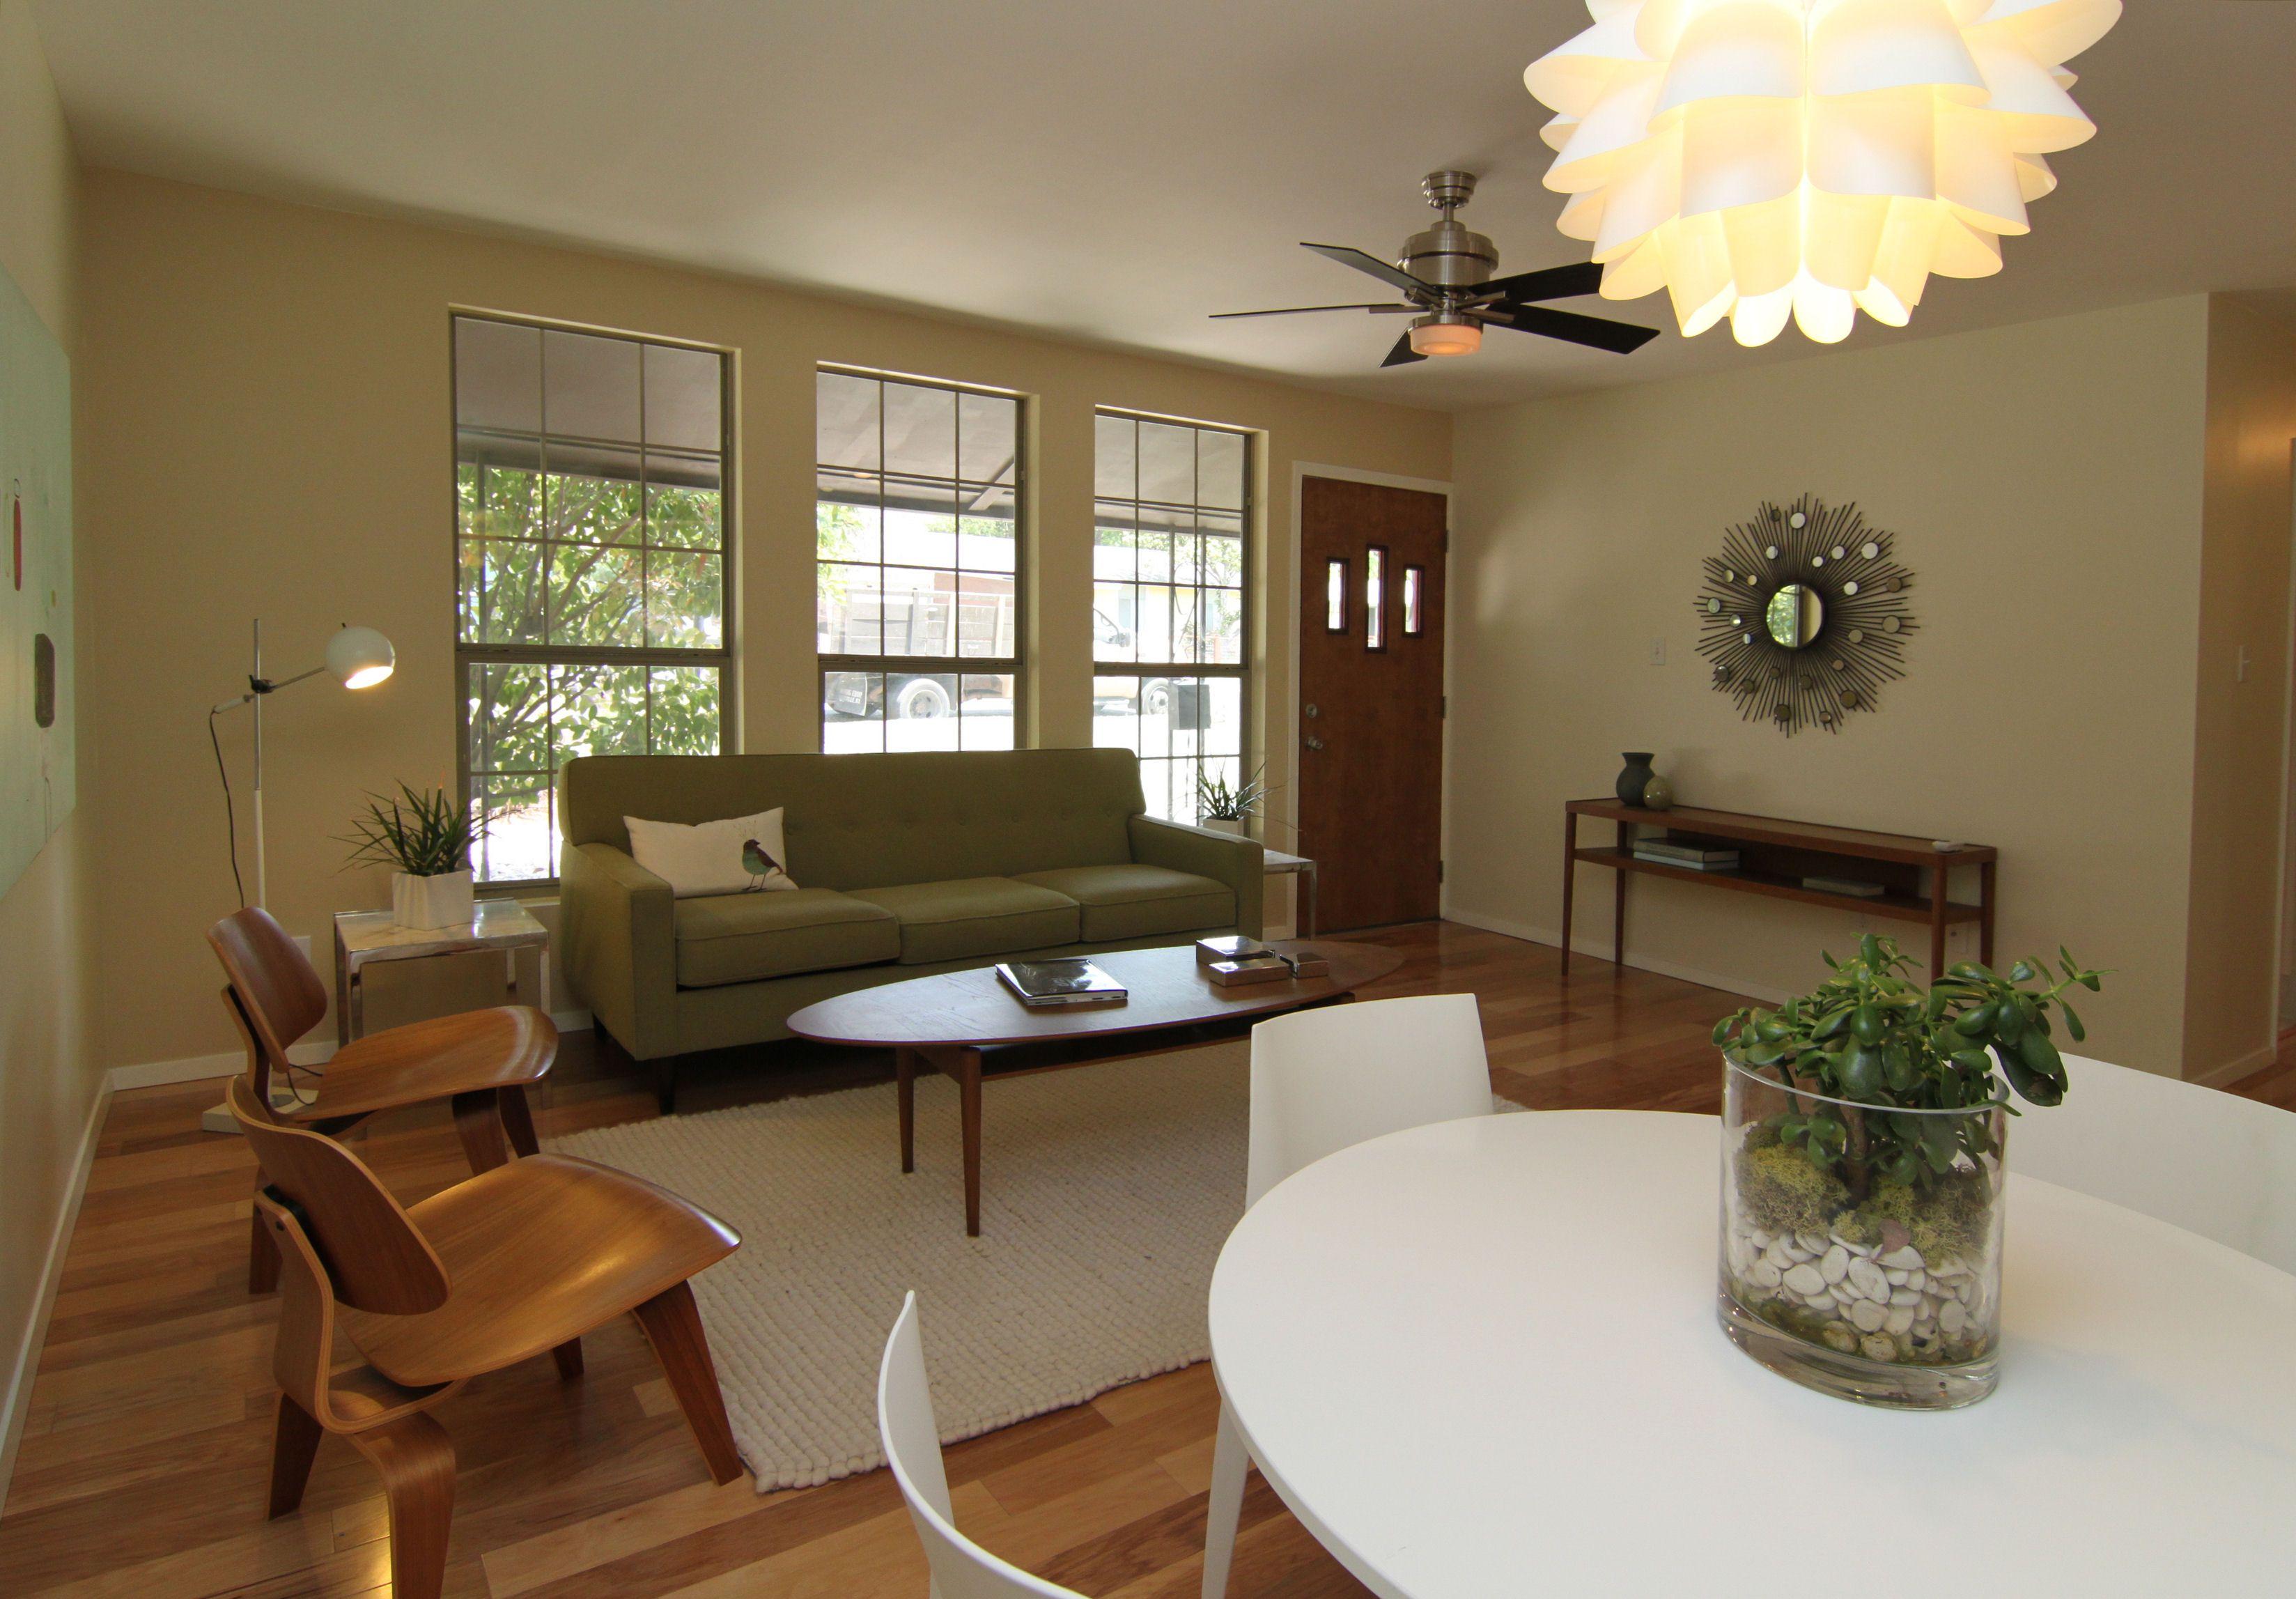 21 Beautiful Mid Century Modern Living Room Ideas  Modern Living Pleasing Dining Room Chairs Mid Century Modern 2018